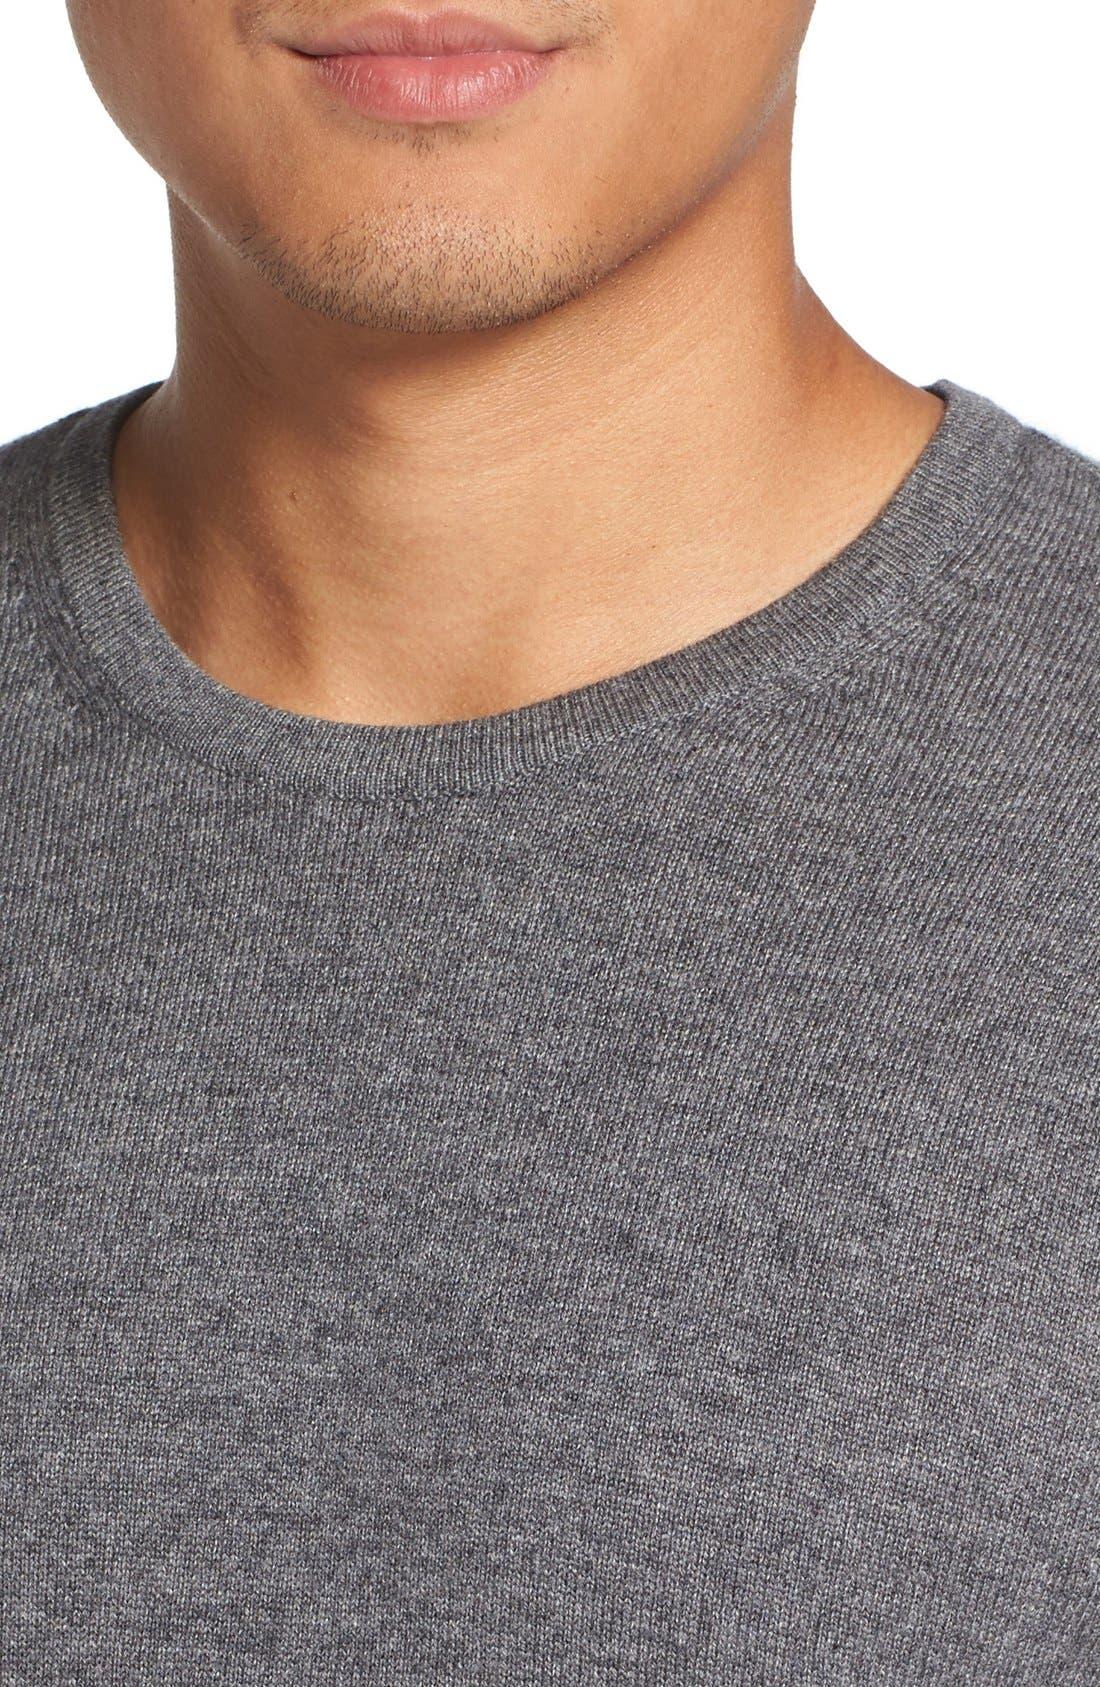 Stripe Wool Blend Sweater,                             Alternate thumbnail 4, color,                             020